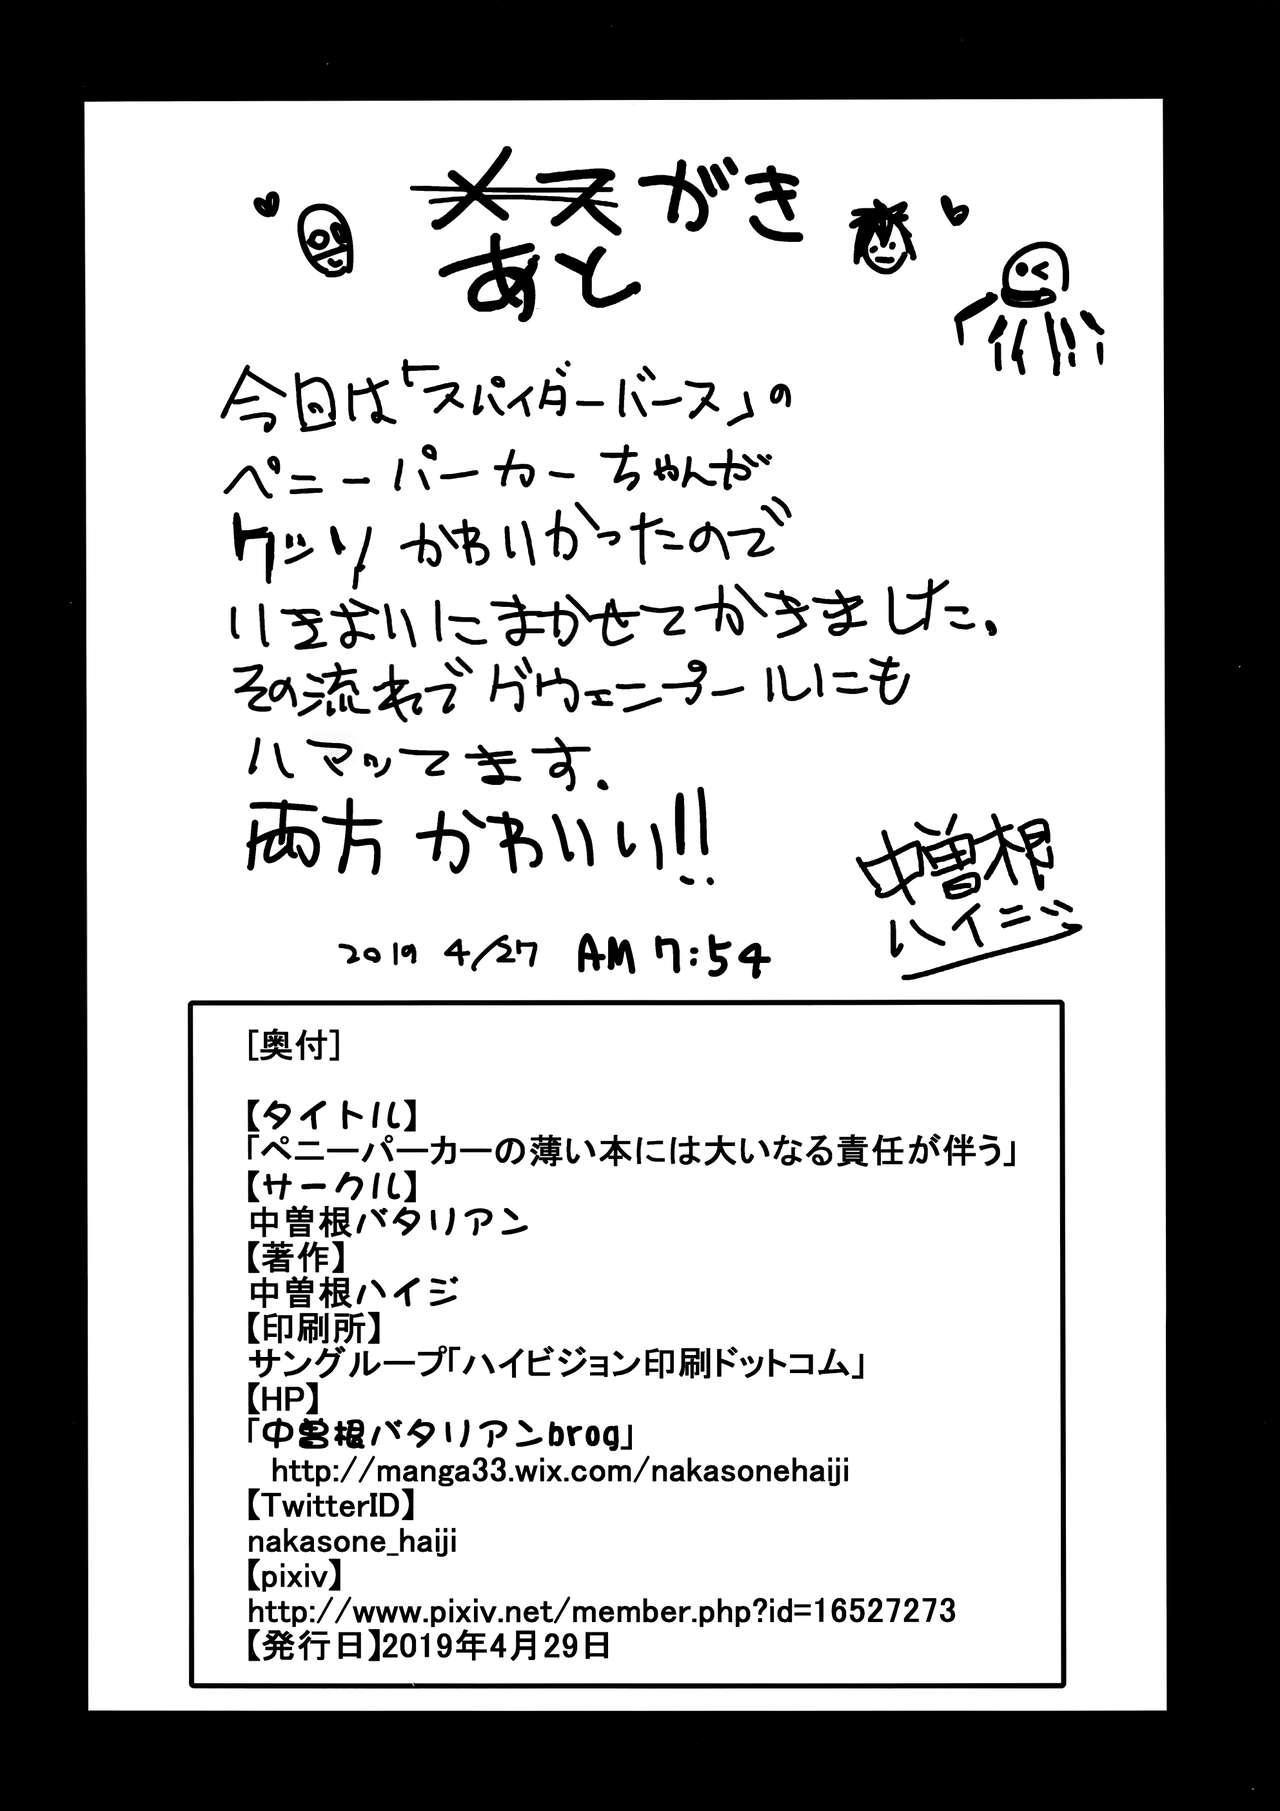 Peni Parker no Usui Hon ni wa Ooinaru Sekinin ga Tomonau   Peni Parker's Thin Book Comes with great Responsibility 14